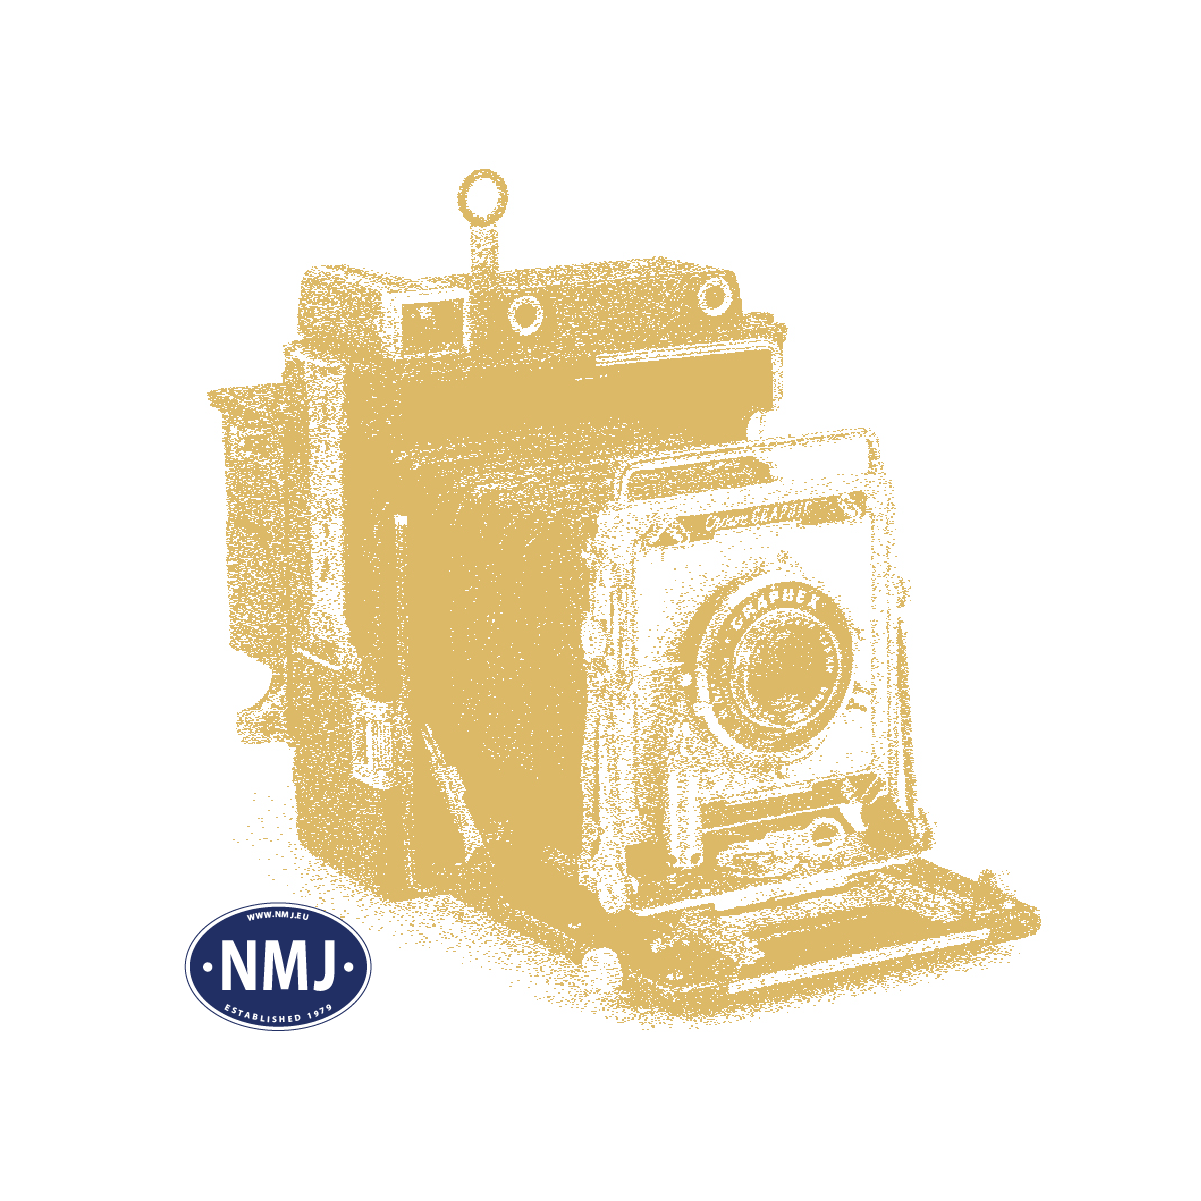 NMJT145301 - NMJ Topline CFL 1601, 0-Scale